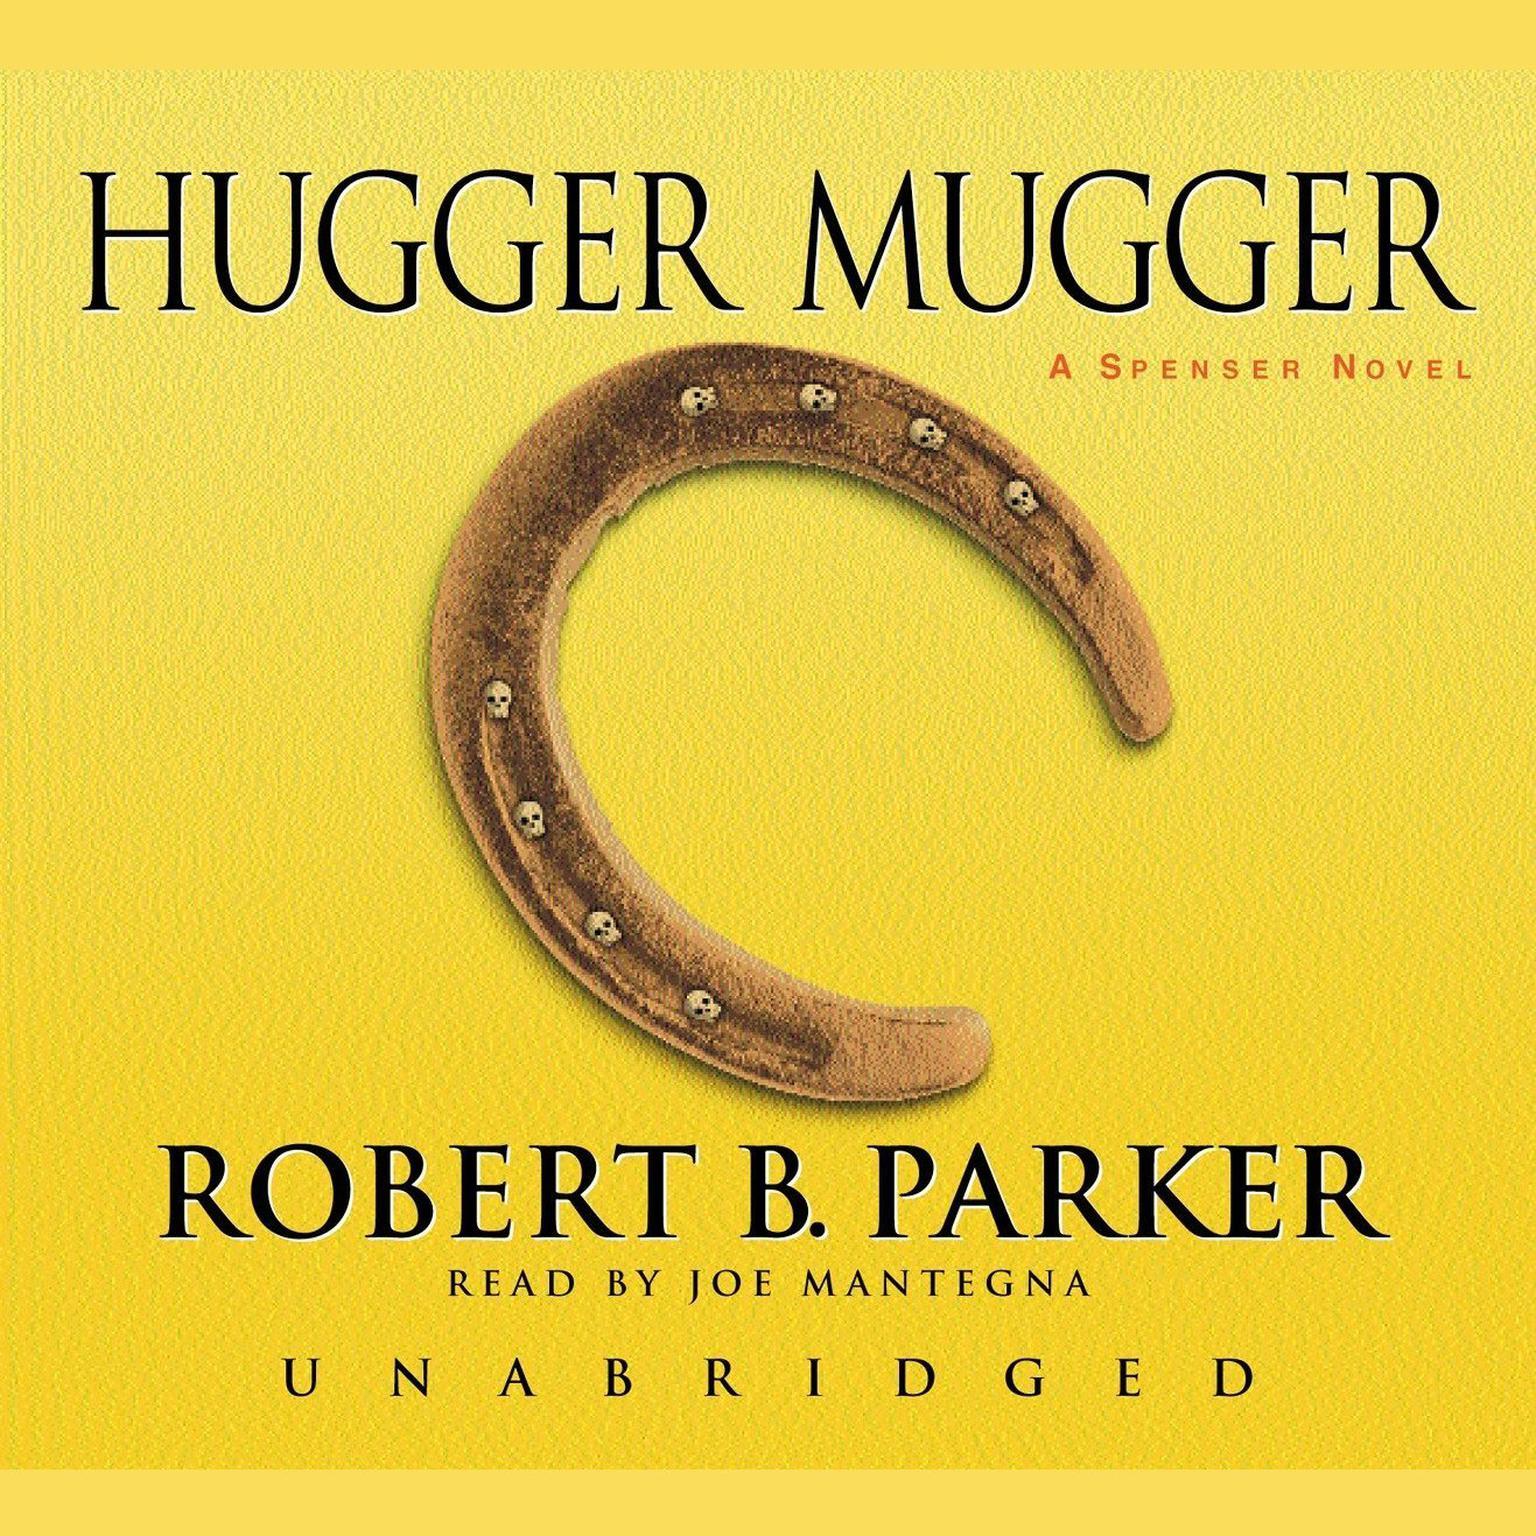 Hugger Mugger Audiobook, by Robert B. Parker